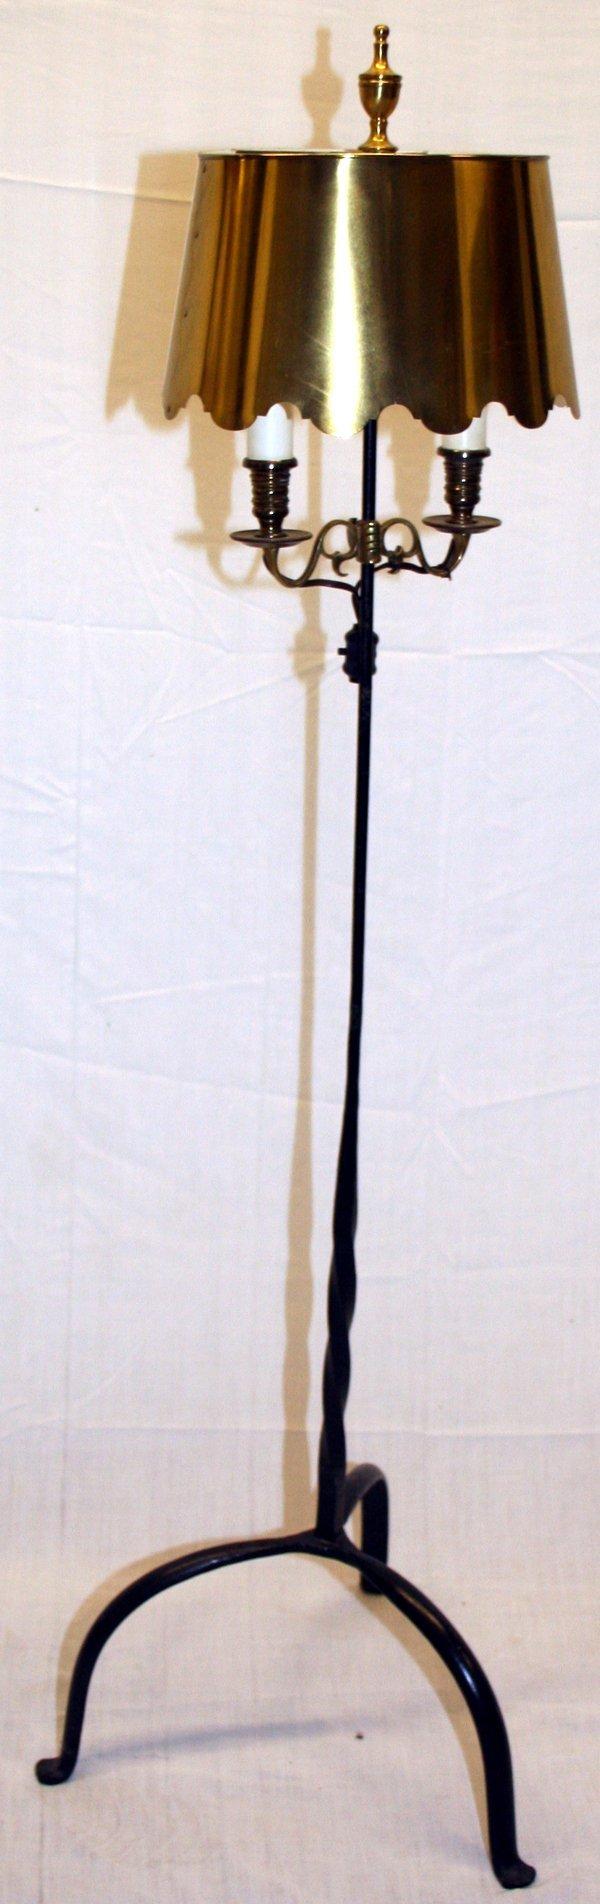 112531: WROUGHT IRON FLOOR LAMP